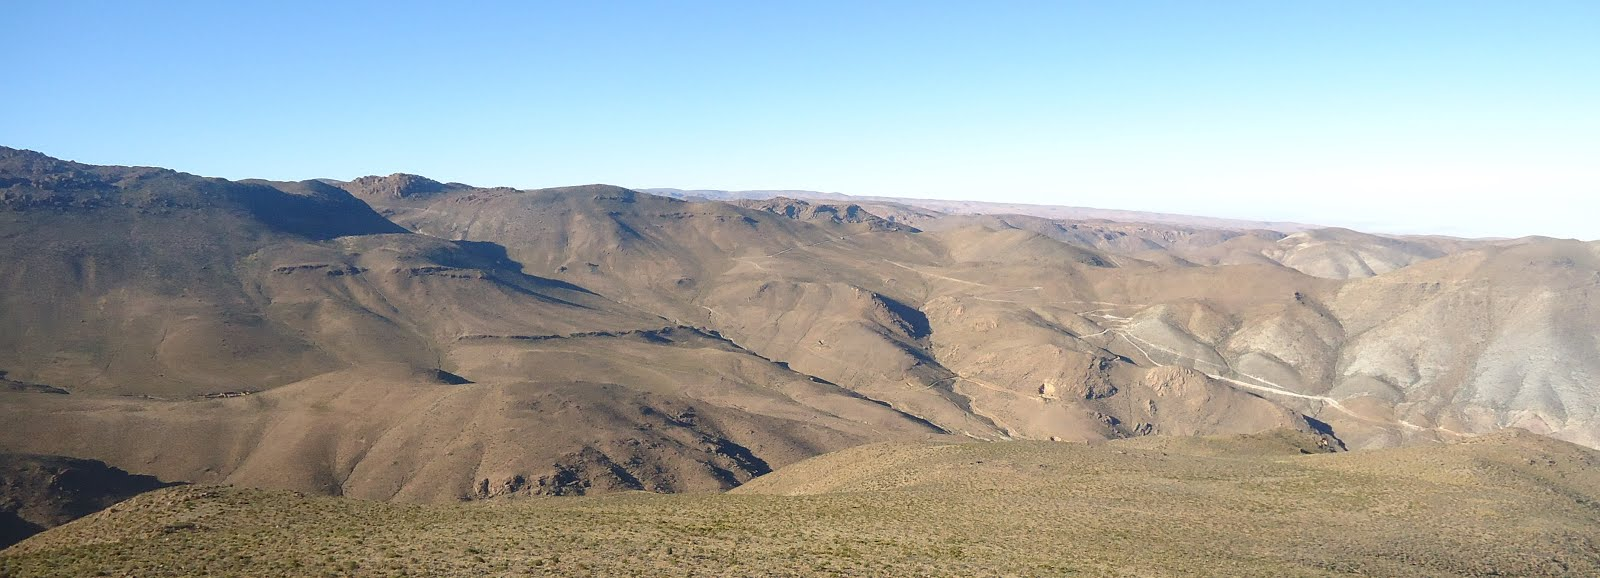 Sur del Perú